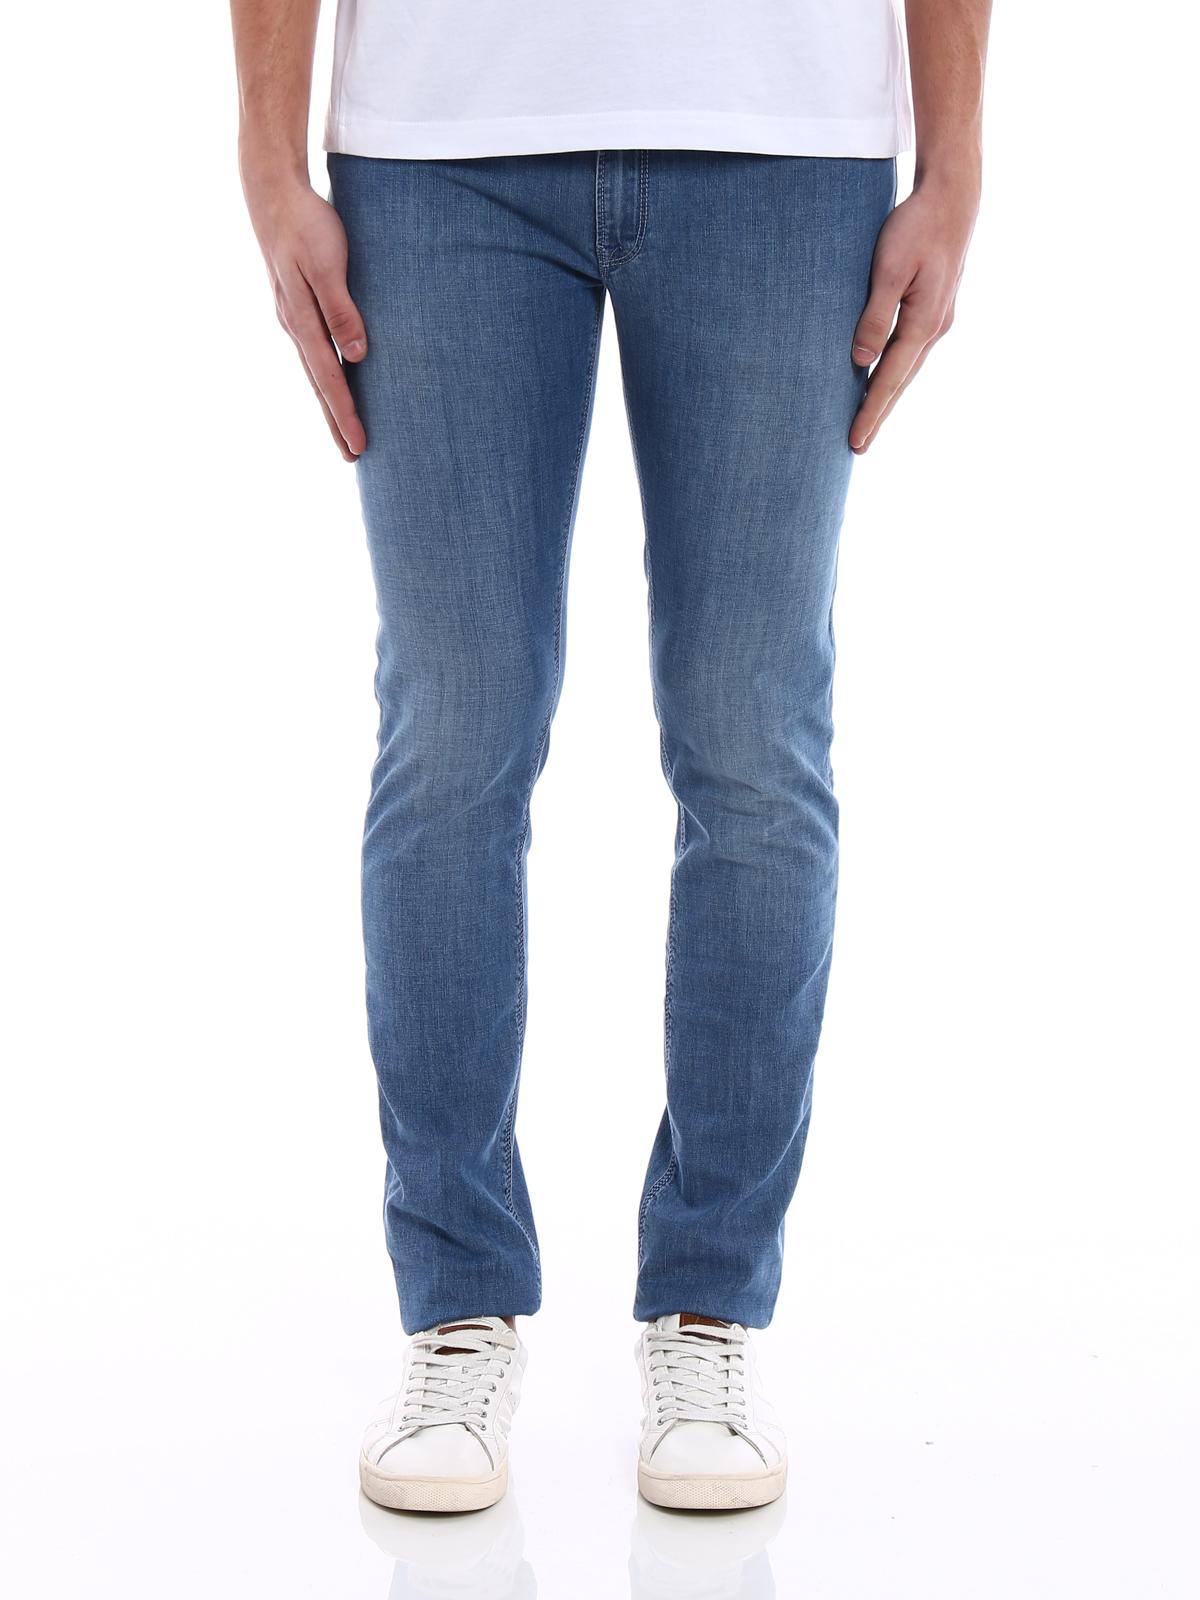 Fay Jeans in denim di cotone slim fit jeans dritti, a